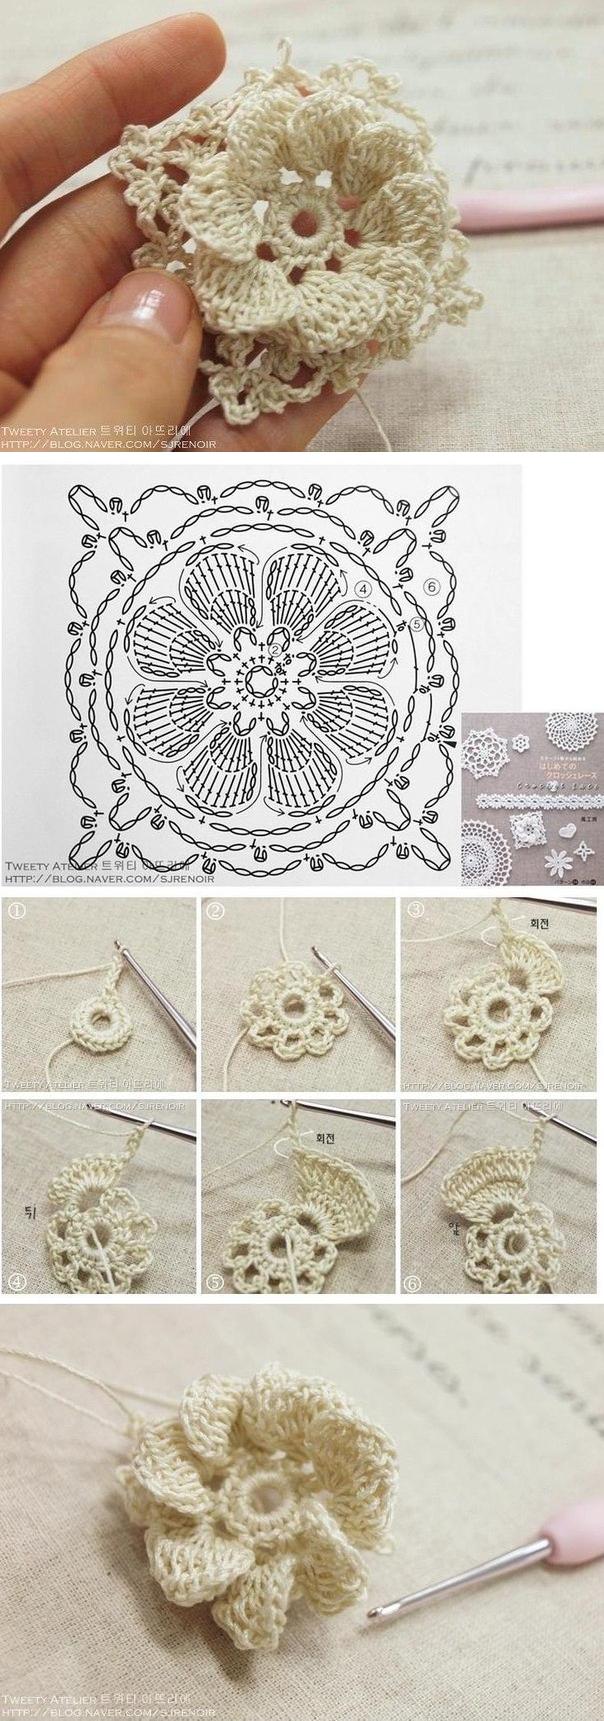 Sin encabezamiento // VALENTINA CERGUTSA | crochet puntillas ...